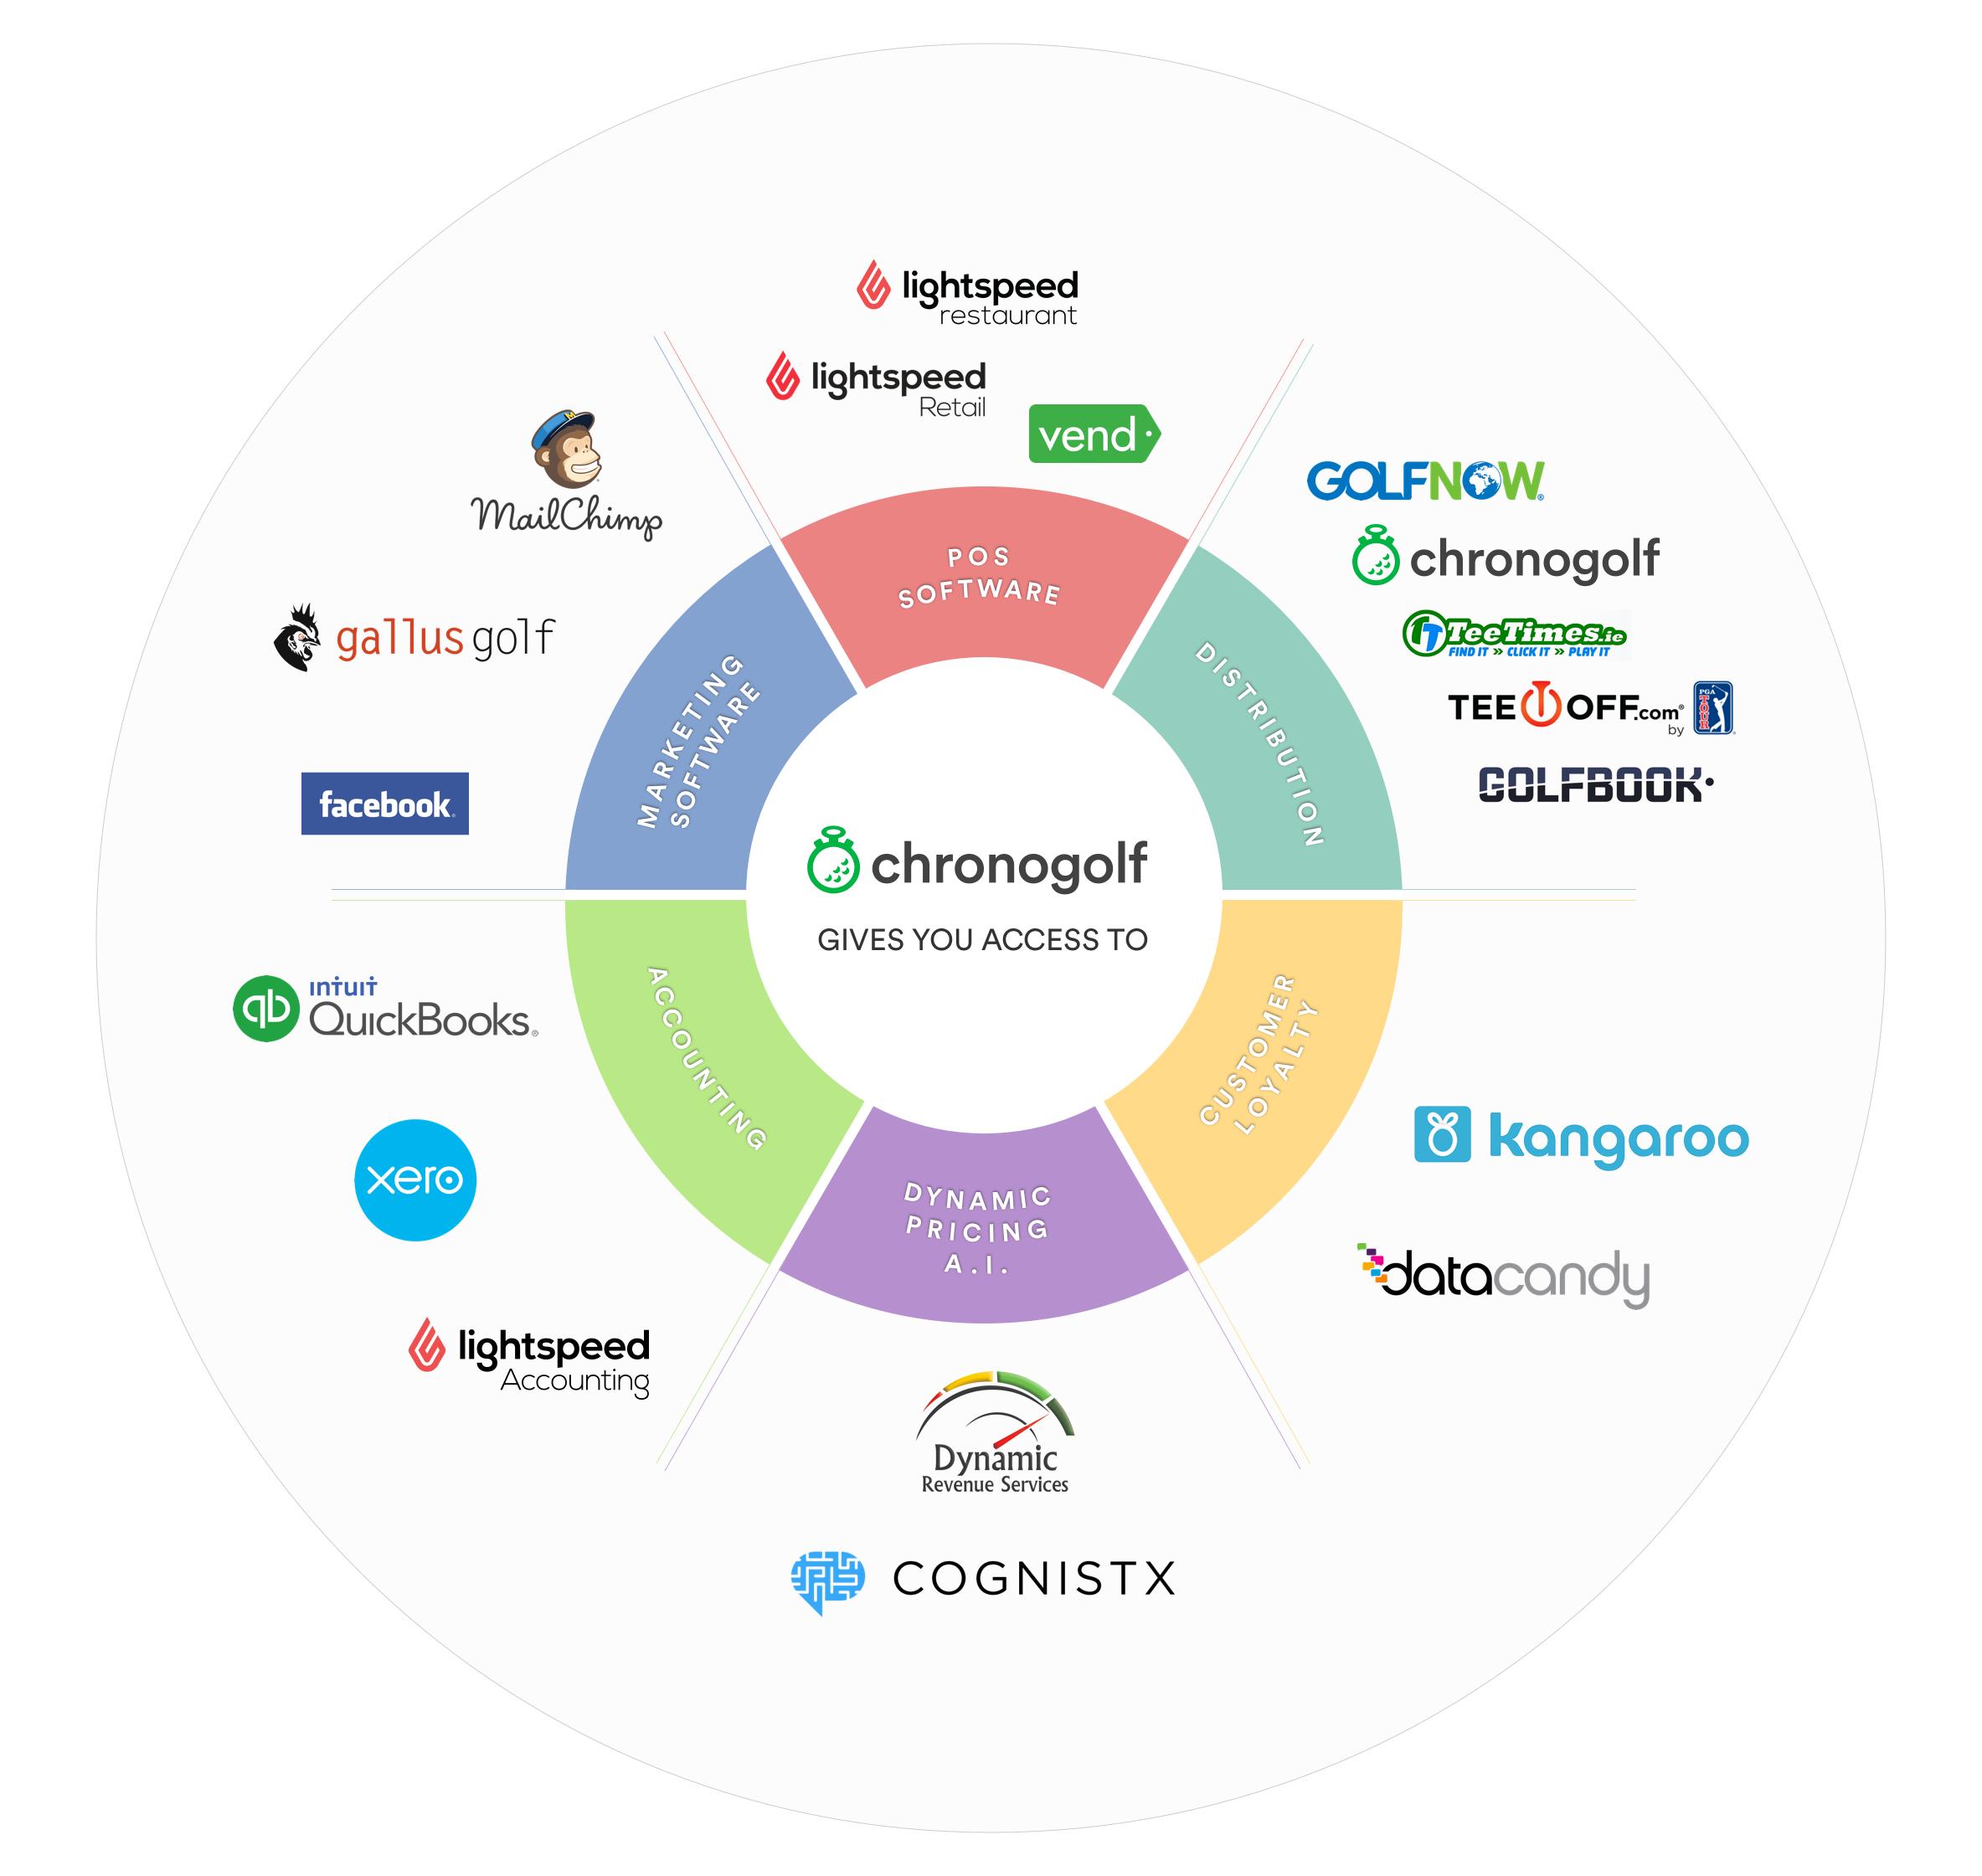 Chronogolf-Integration